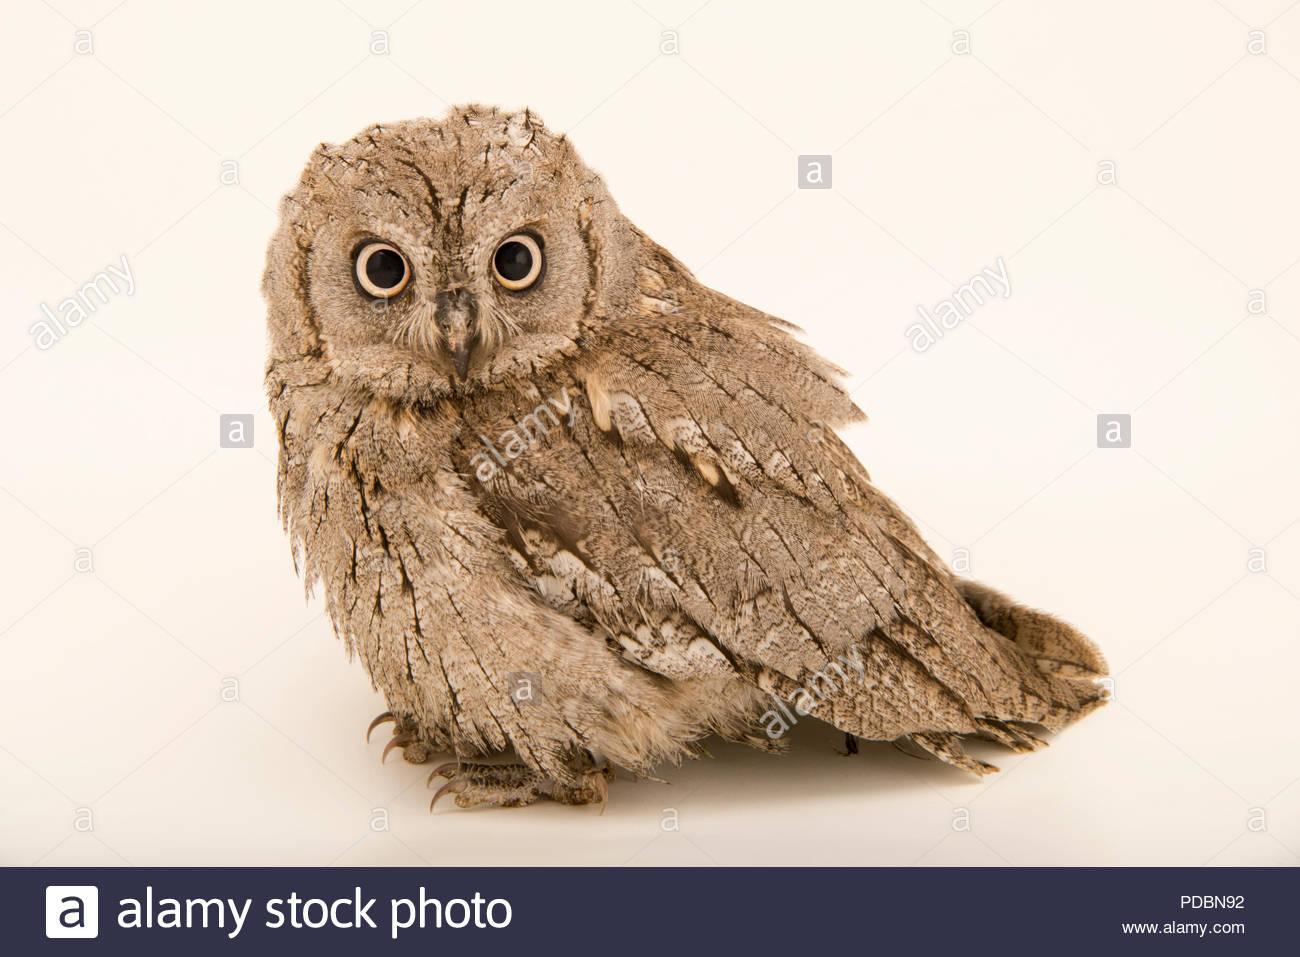 Eurasian scops owl, Otus scops scops, at Alpenzoo in Innsbruck, Austria. - Stock Image